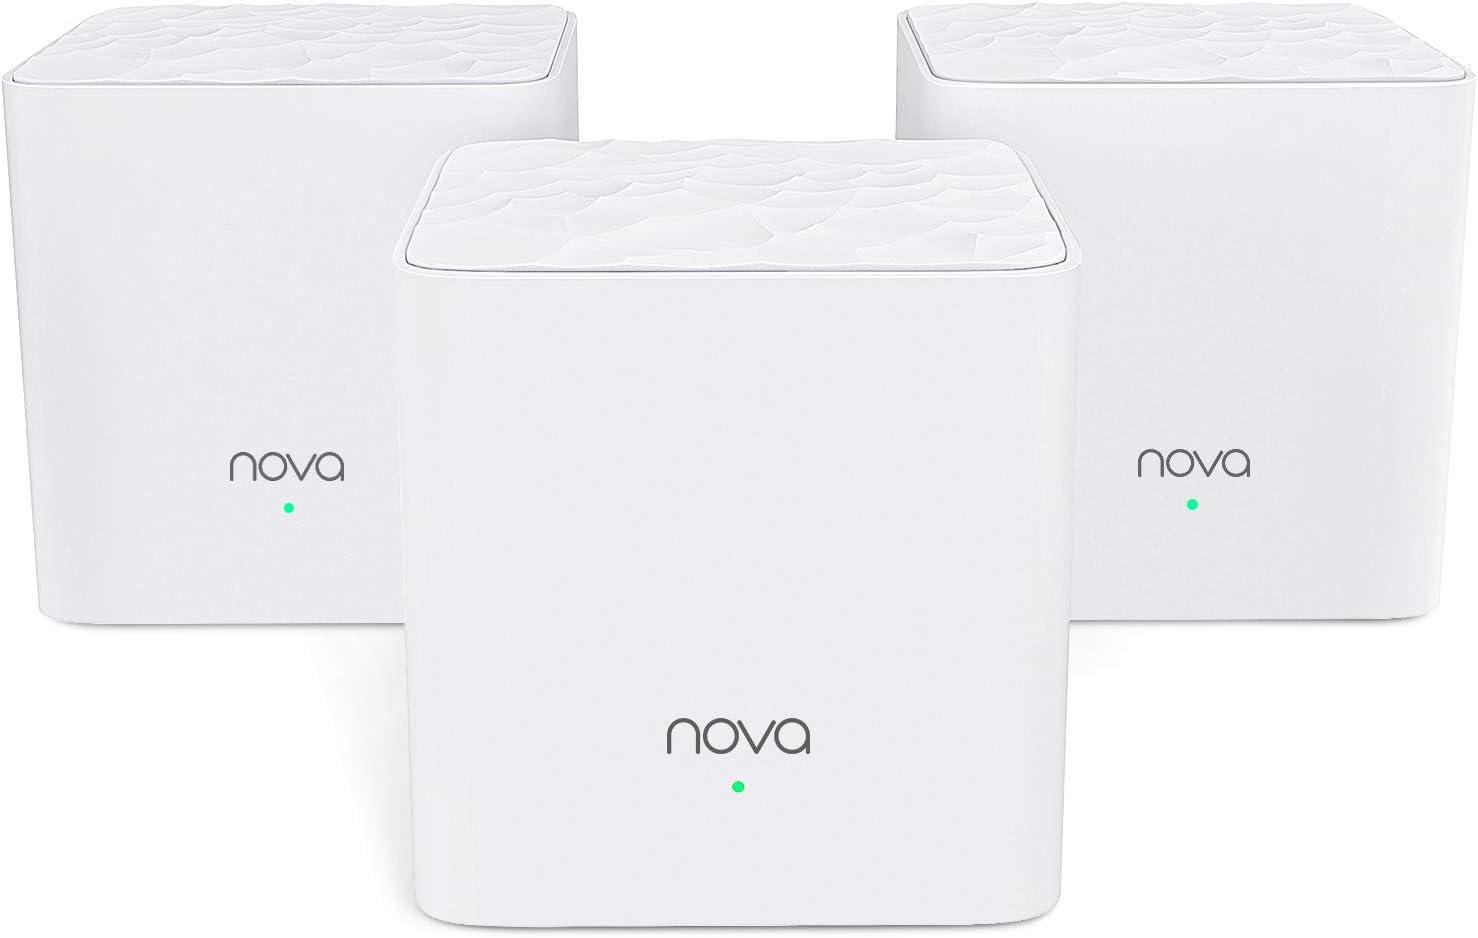 Tenda NOVA MW3 Mesh Router Sistema WiFi de Red en Malla (AC1200, 2.4GHz +5 GHz,Plug and Play, Mu-MIMO,Fast Ethernet 10/100,Funciona con Alexa sustituye tu Repetidor Extensor de Red Tradicional)Pack 3